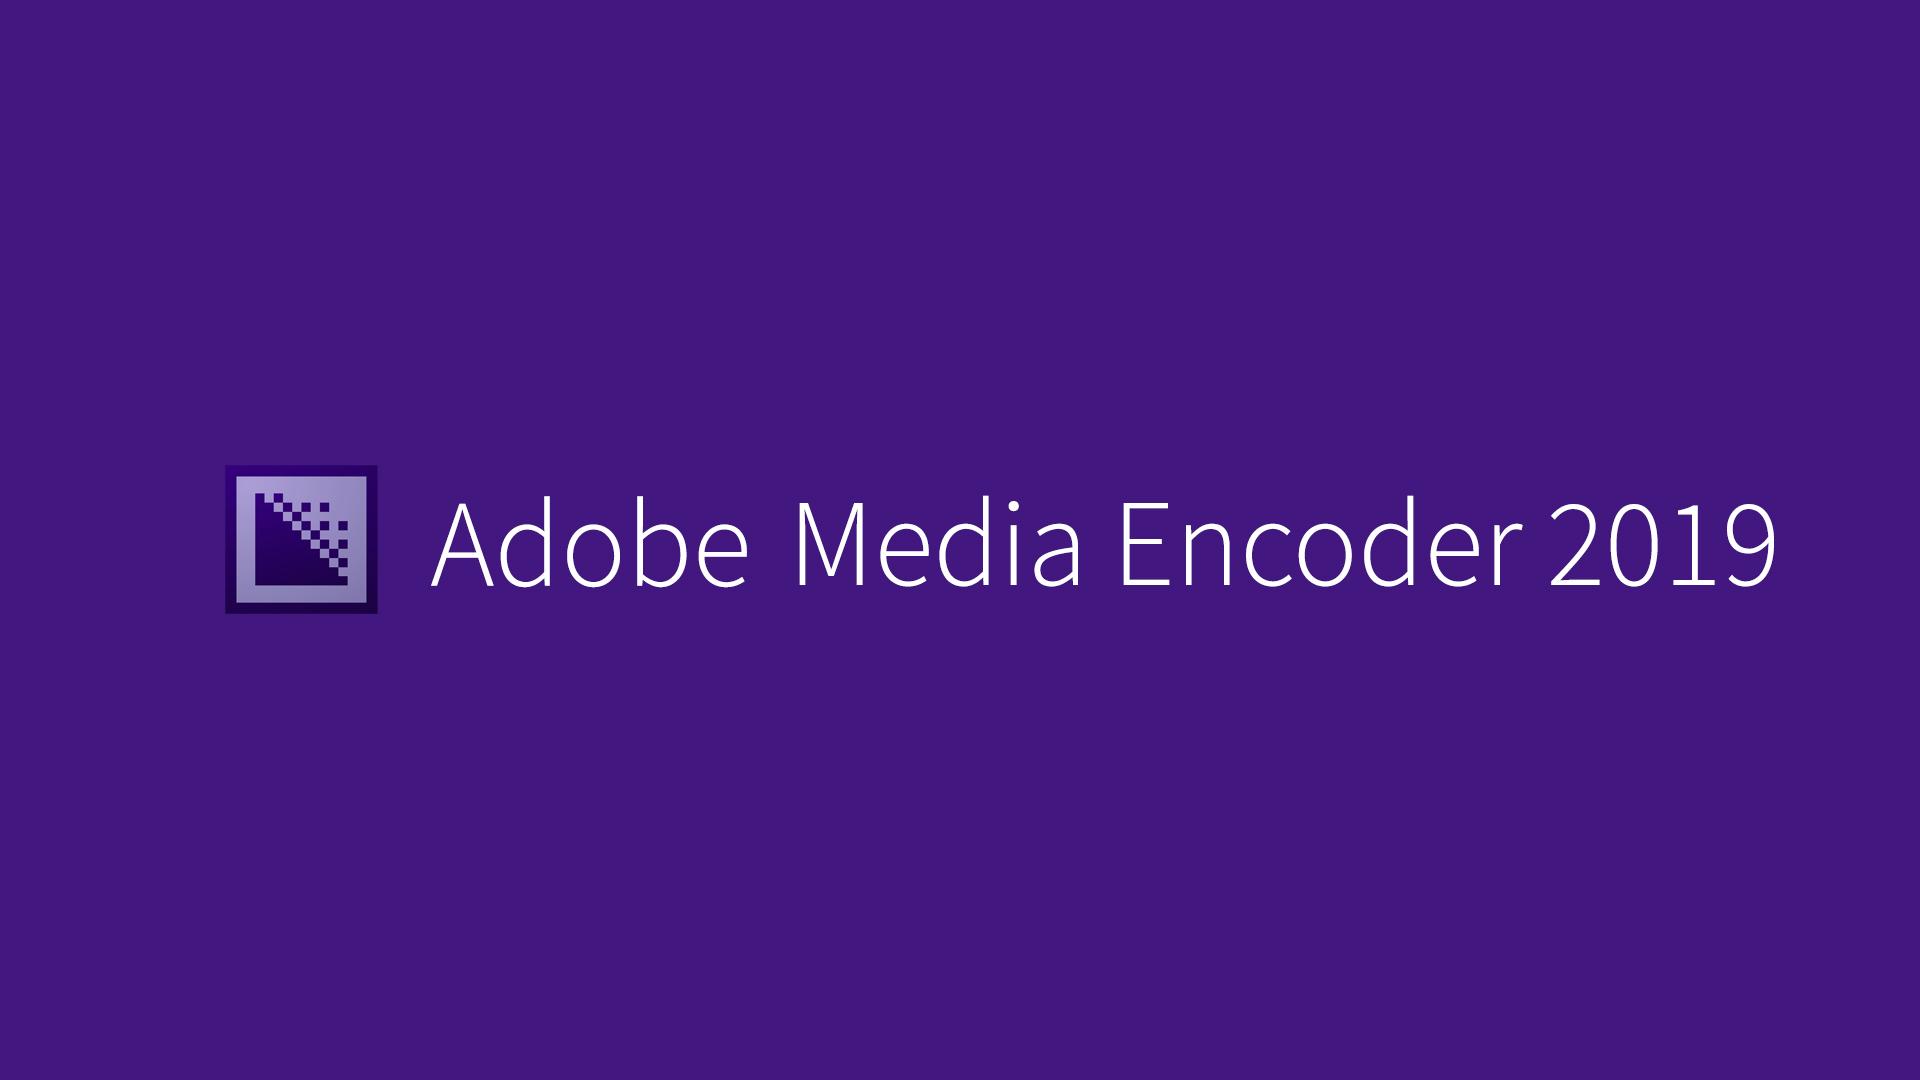 Adobe Media Encoder 2019 Free Download